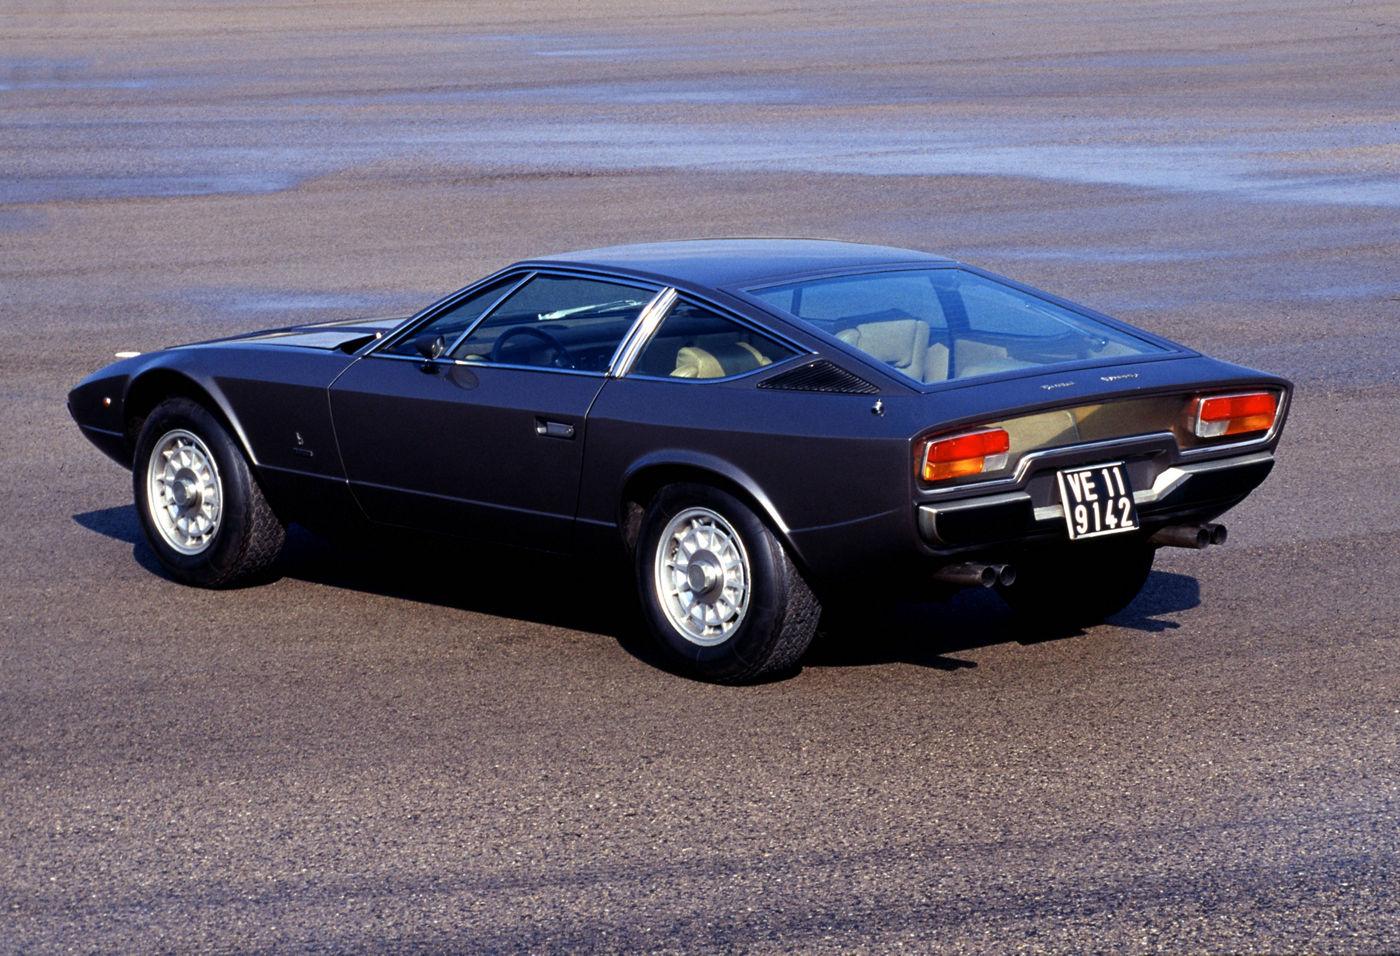 Maserati Classic - GranTurismo Khamsin - carrosserie grise - vue latérale postérieure